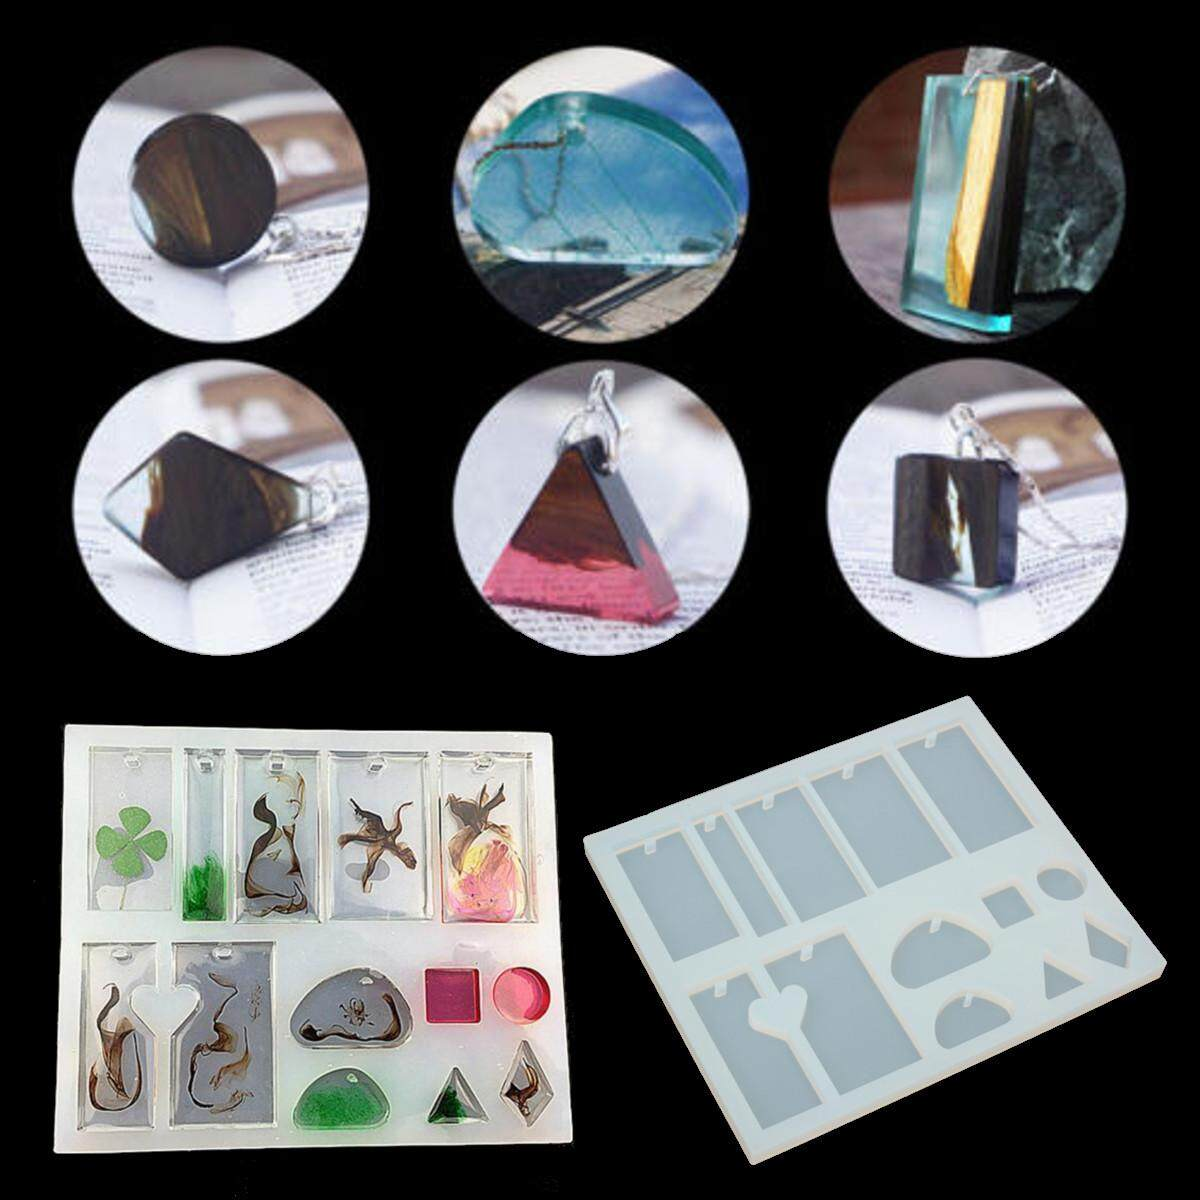 Mua DIY Crystal Geometric Jewelry Mold Pendant Silicone Ornament Resin Craft Making - intl